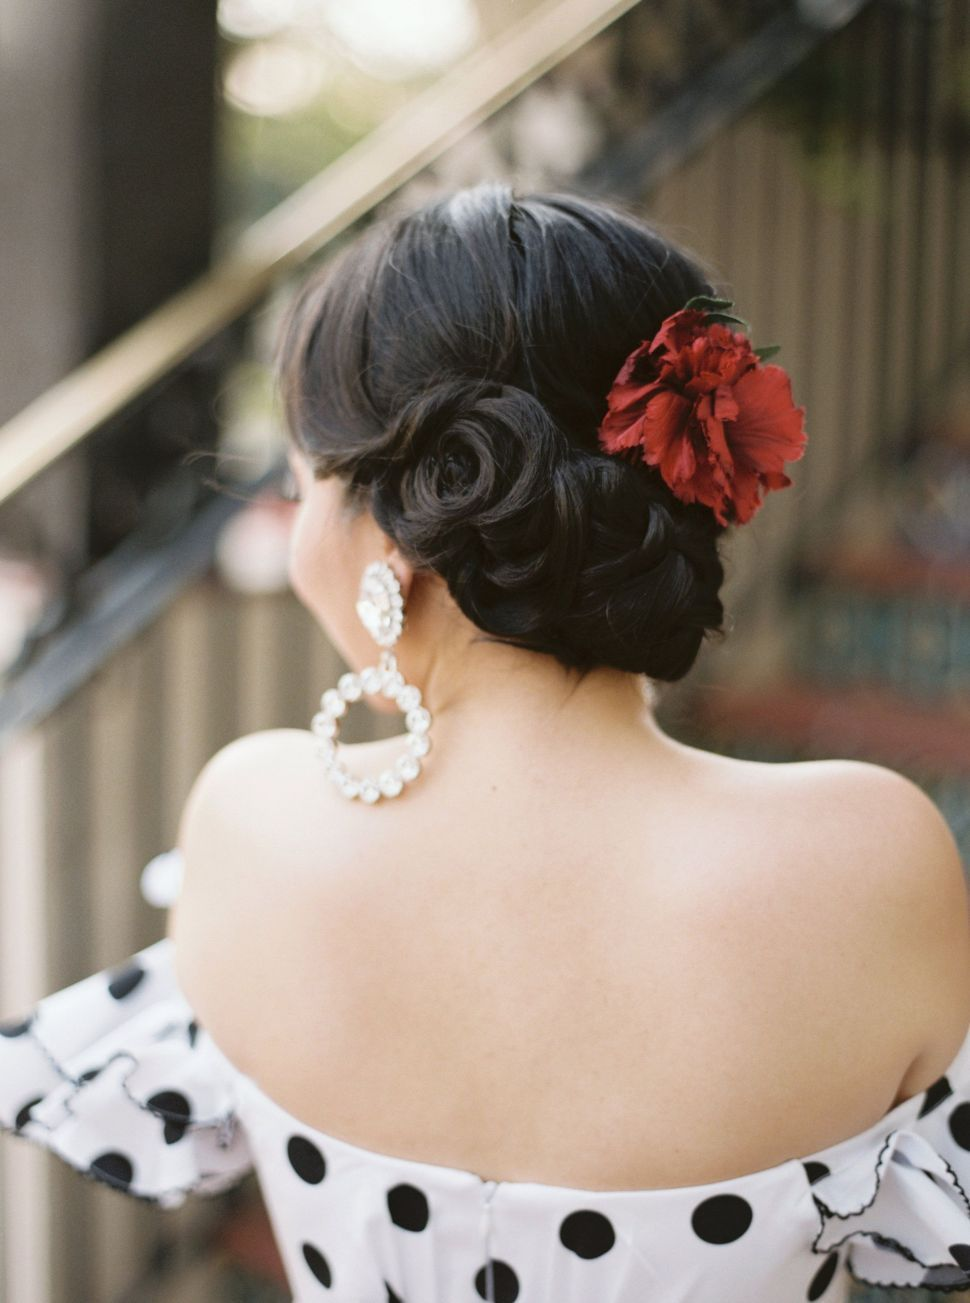 Spanish Bun Hairstyle Bunhairstyles Hairstyles Weddinghairstyles Weddinghair Blackhairstyles Spanish Hairstyles Hair Styles Afro Hairstyles